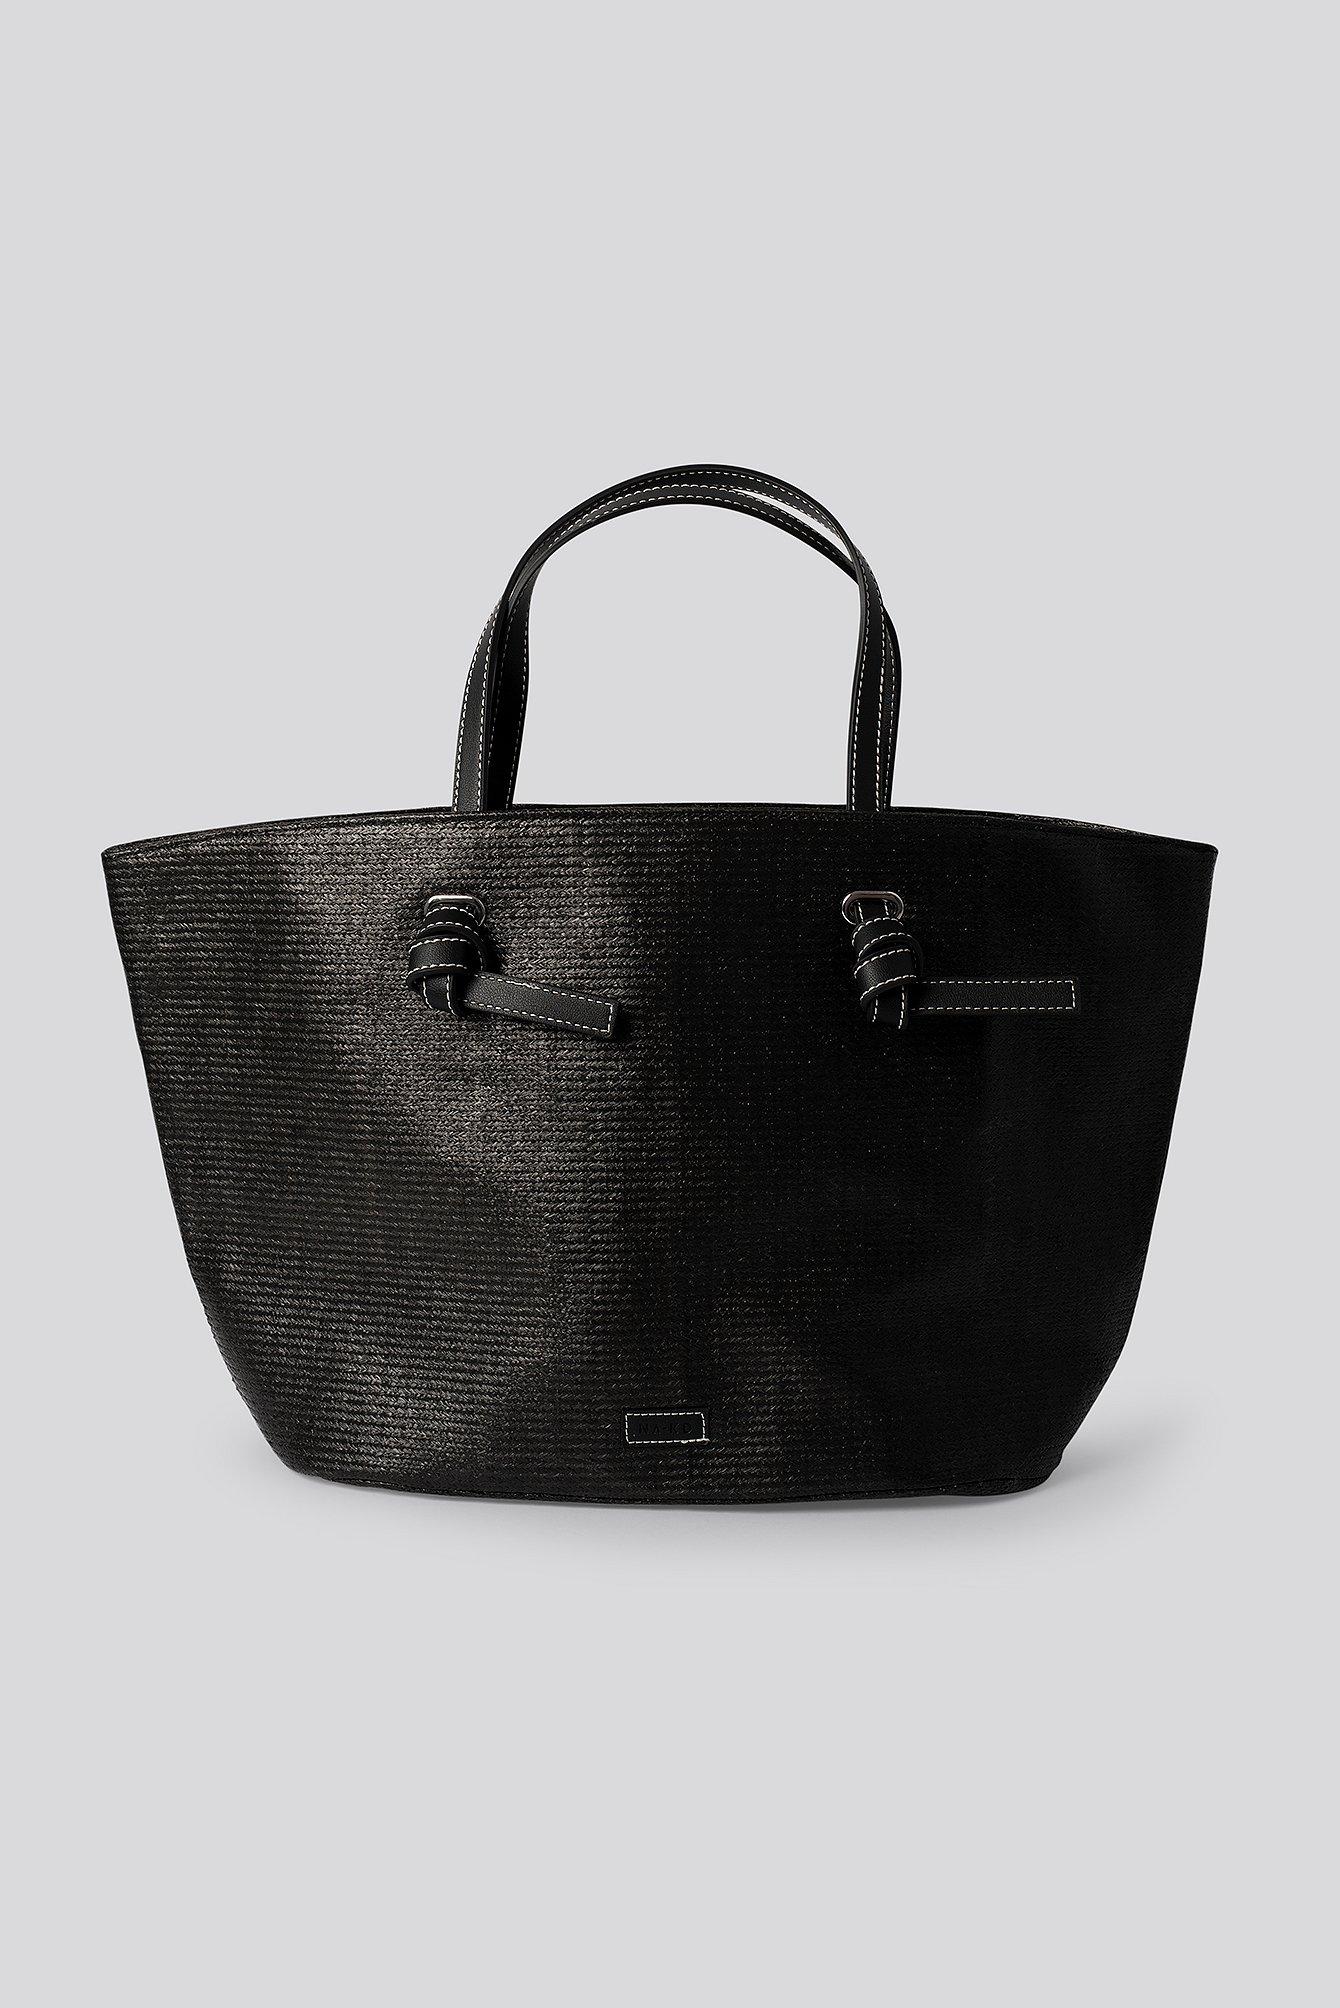 NA-KD Accessories Raffia Basket Tote - Black